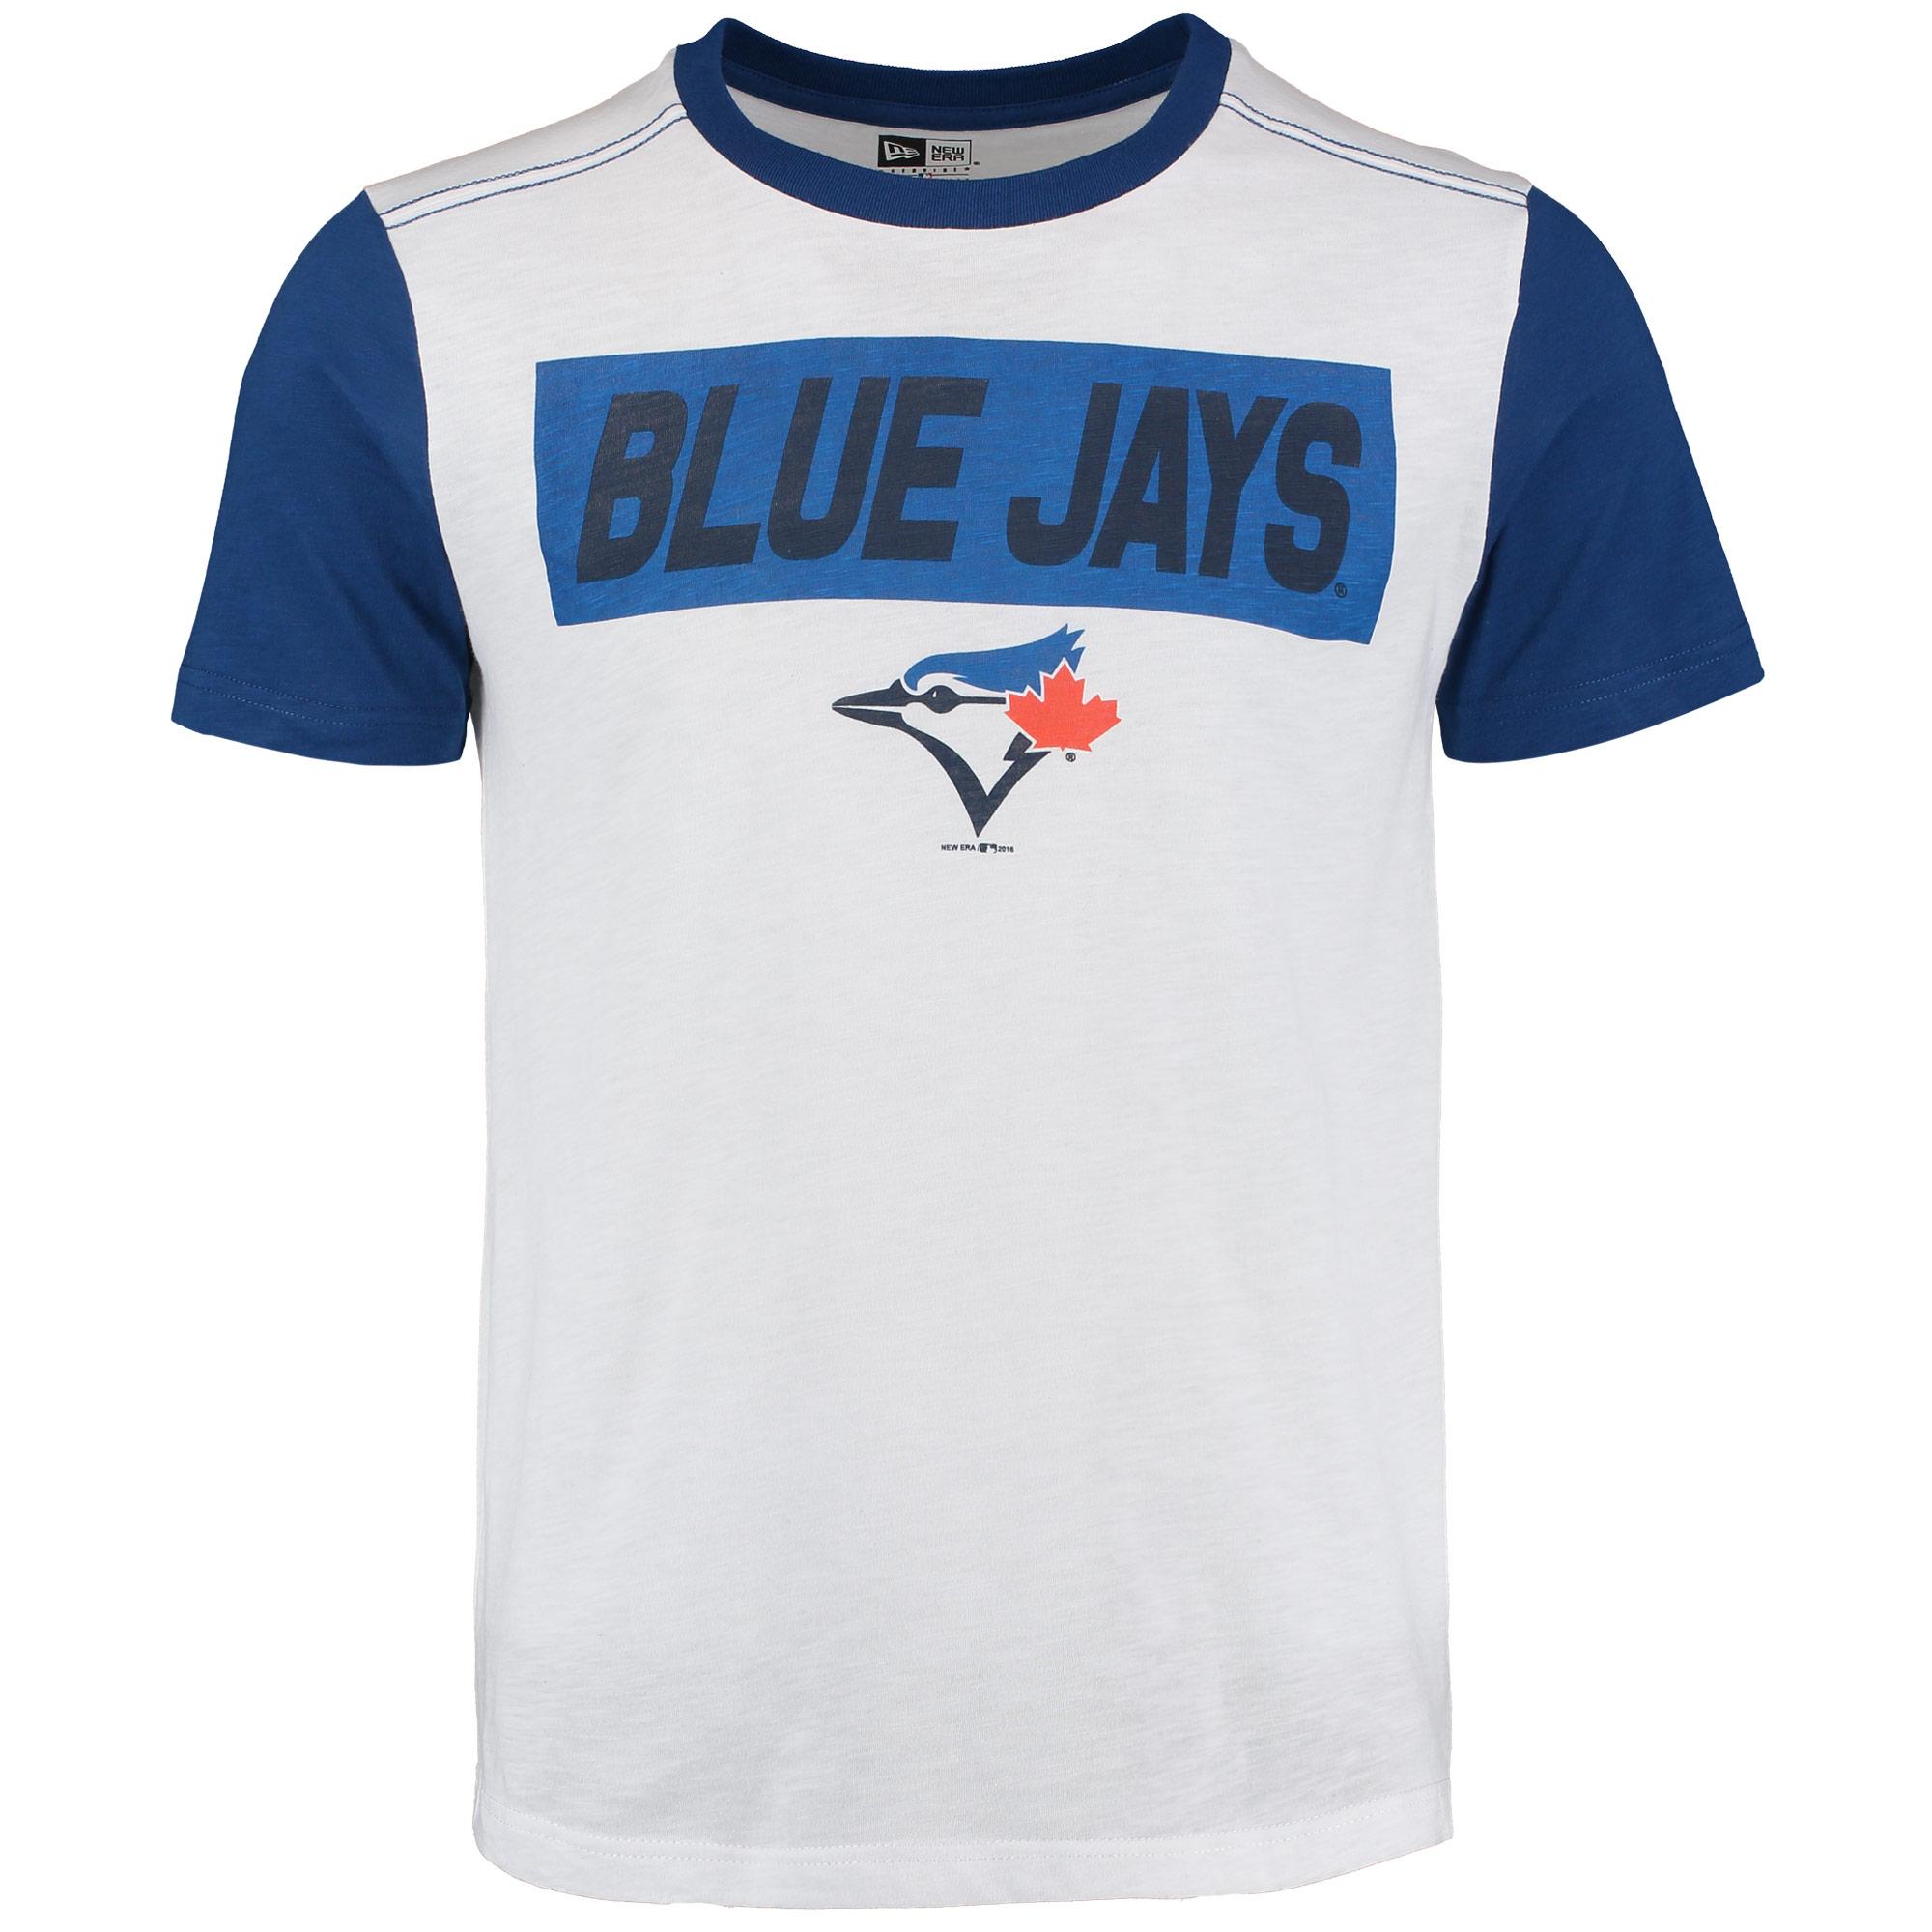 Toronto Blue Jays New Era Slub Crew Neck T-Shirt with Contrast Sleeves - White/Royal